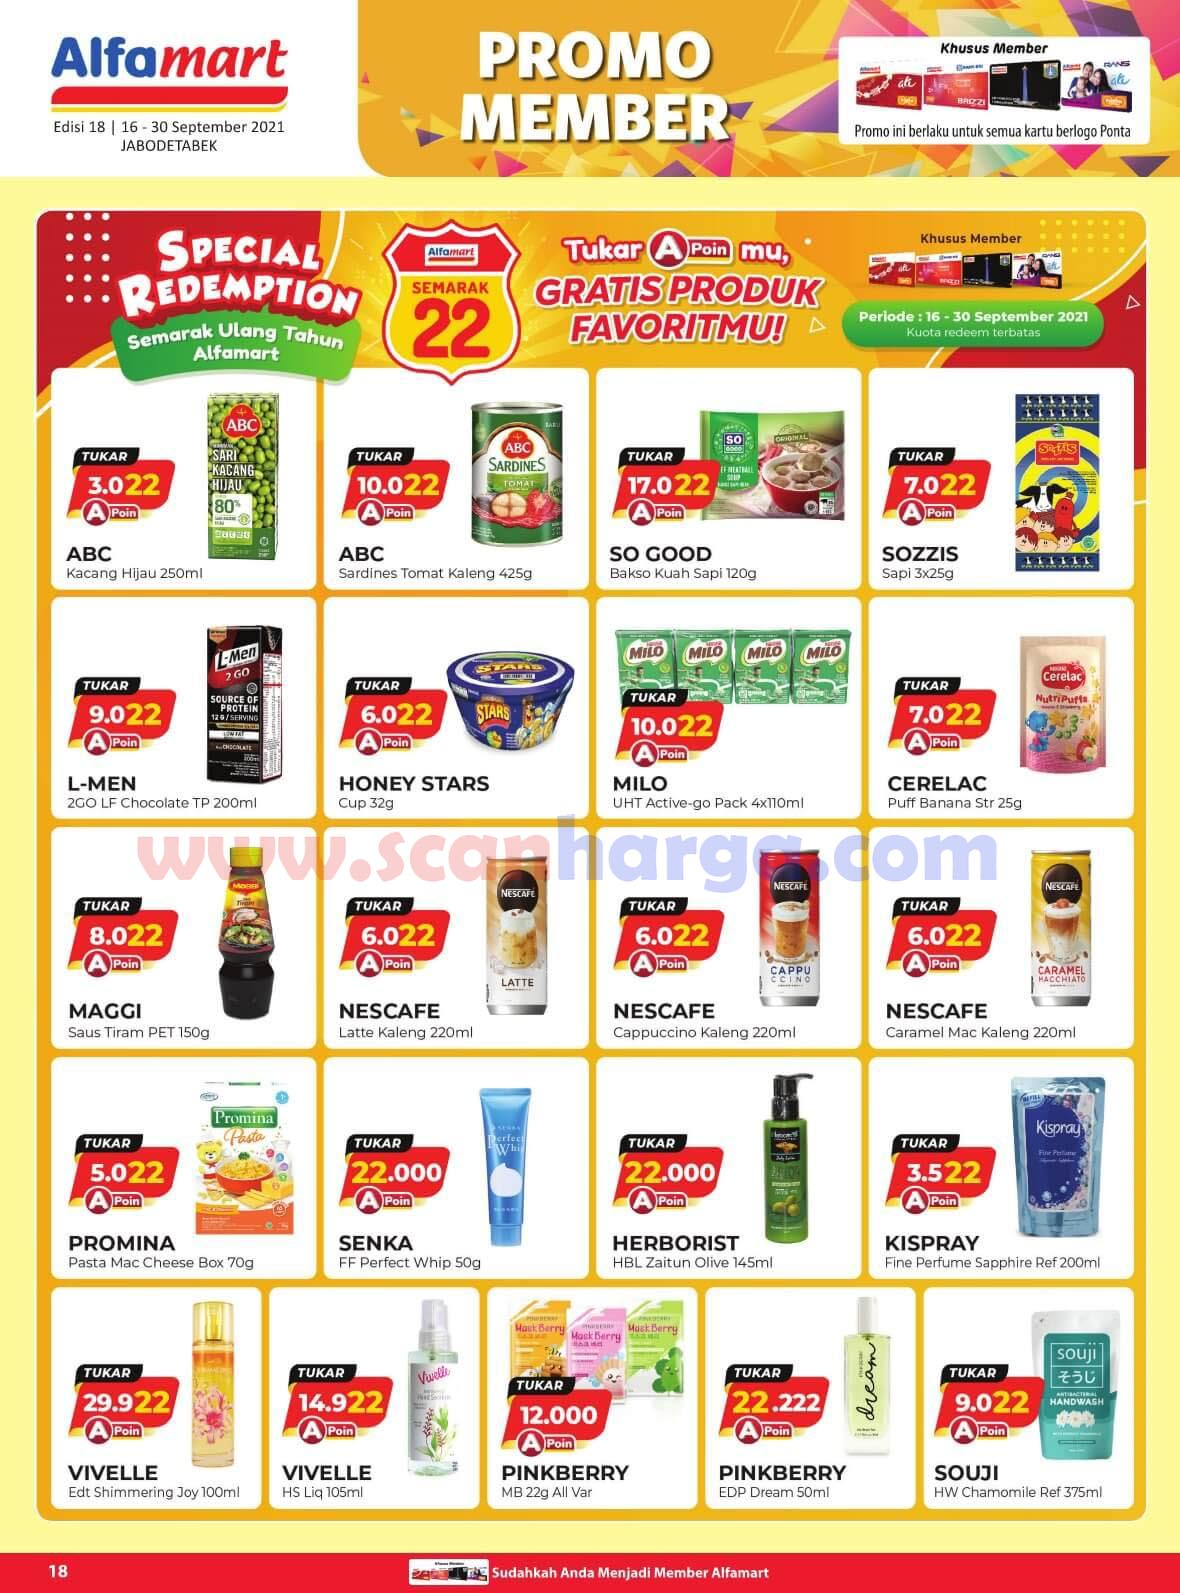 Katalog Promo Alfamart 16 - 30 September 2021 18